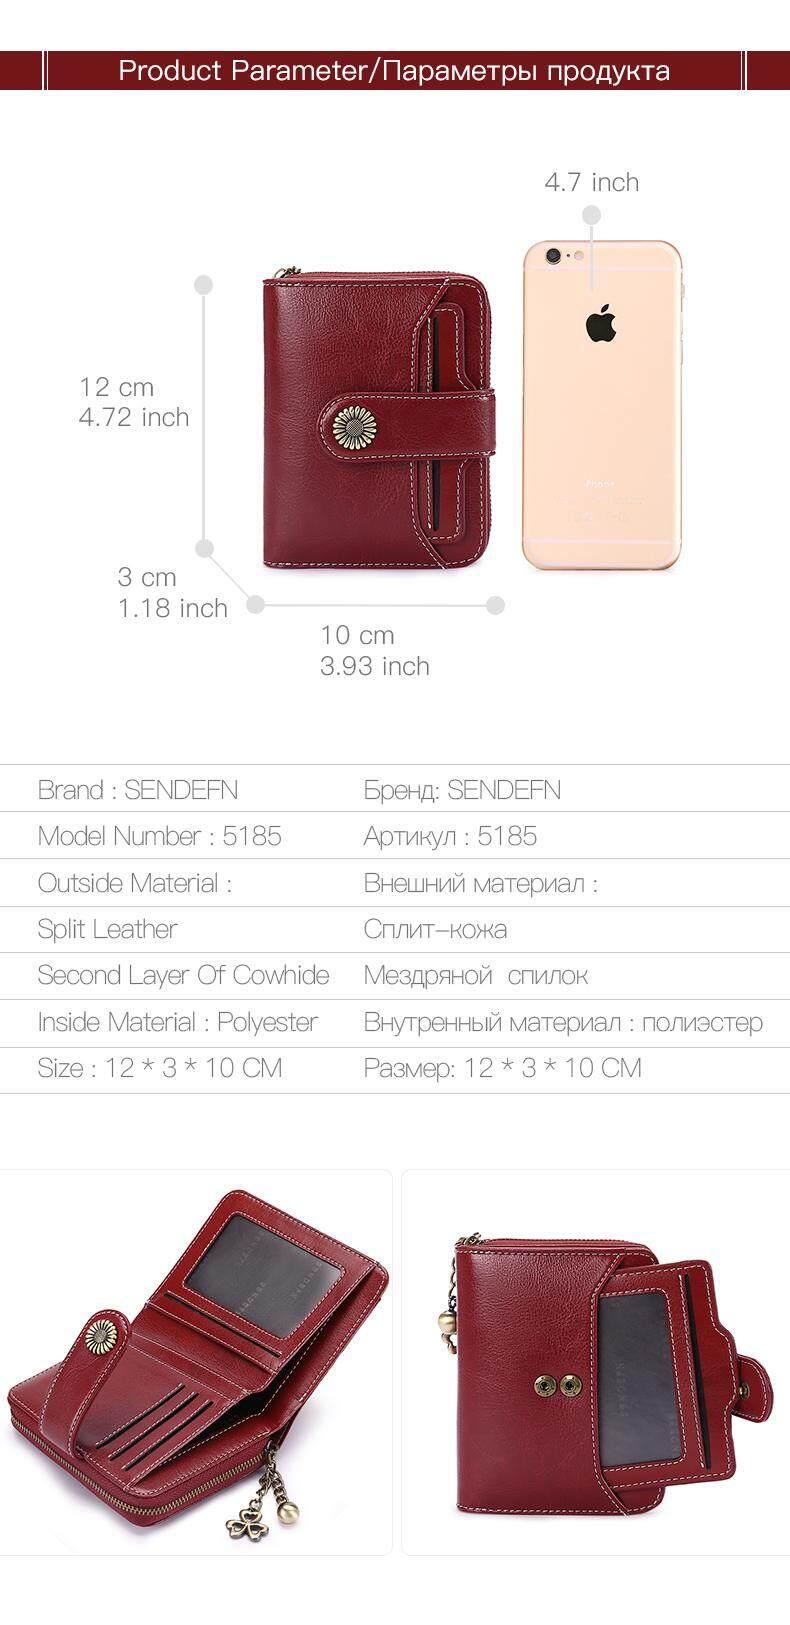 Specifications of Sendefn Wallet Elegant Small Leather Wallet Women Vintage Short Coin Purse Female Wallet Zipper Button Designer Patent Hardware